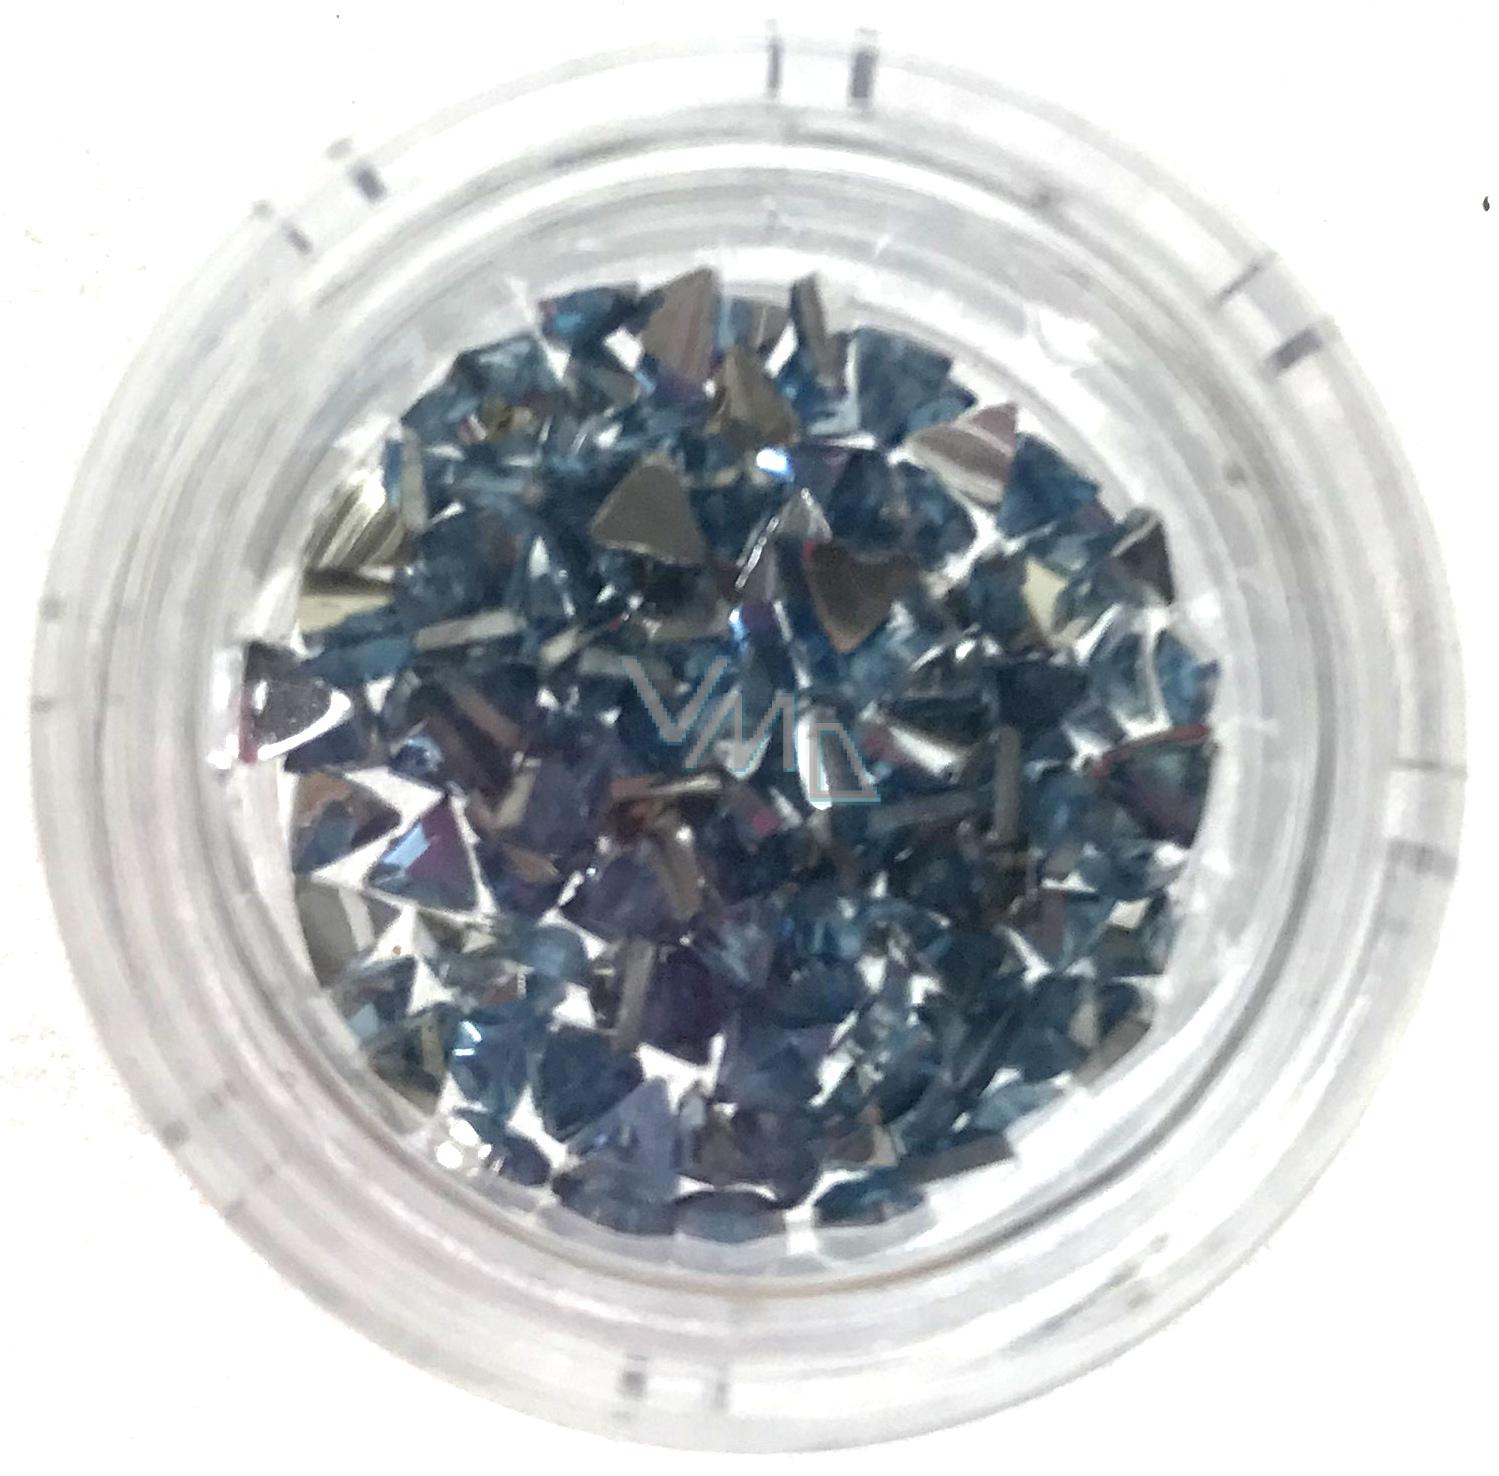 Professional Ozdoby Na Nehty Kaminky Trojuhelnik Modre 132 Vmd Drogerie A Parfumerie